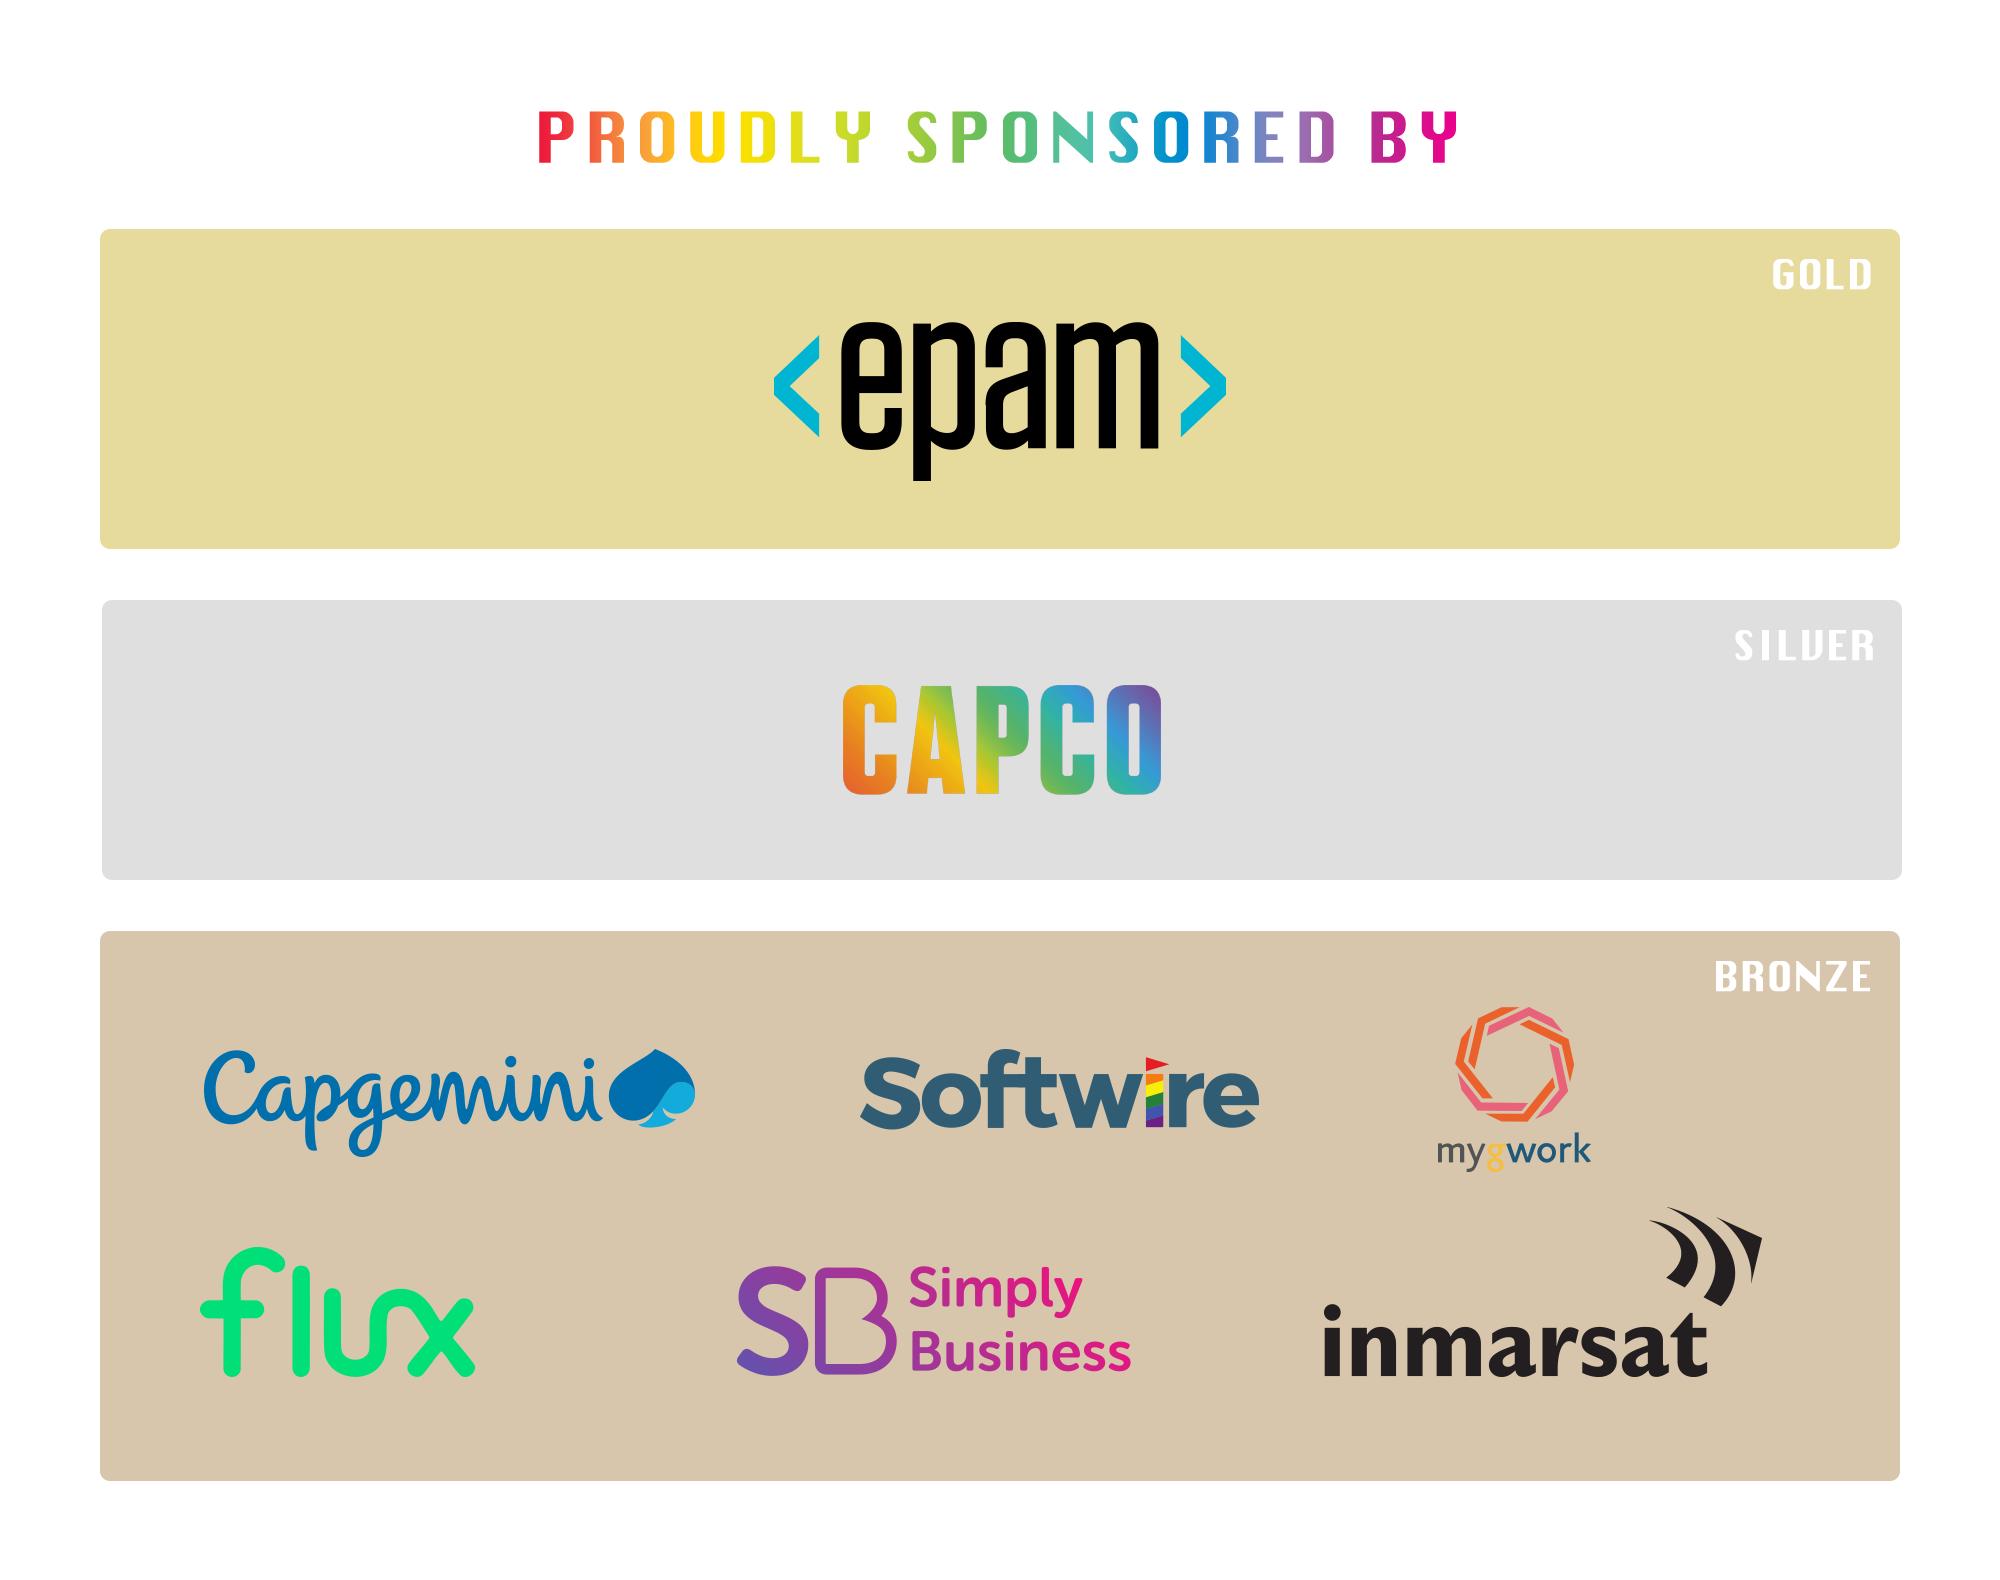 Intertech Pride in London 2019 Sponsors